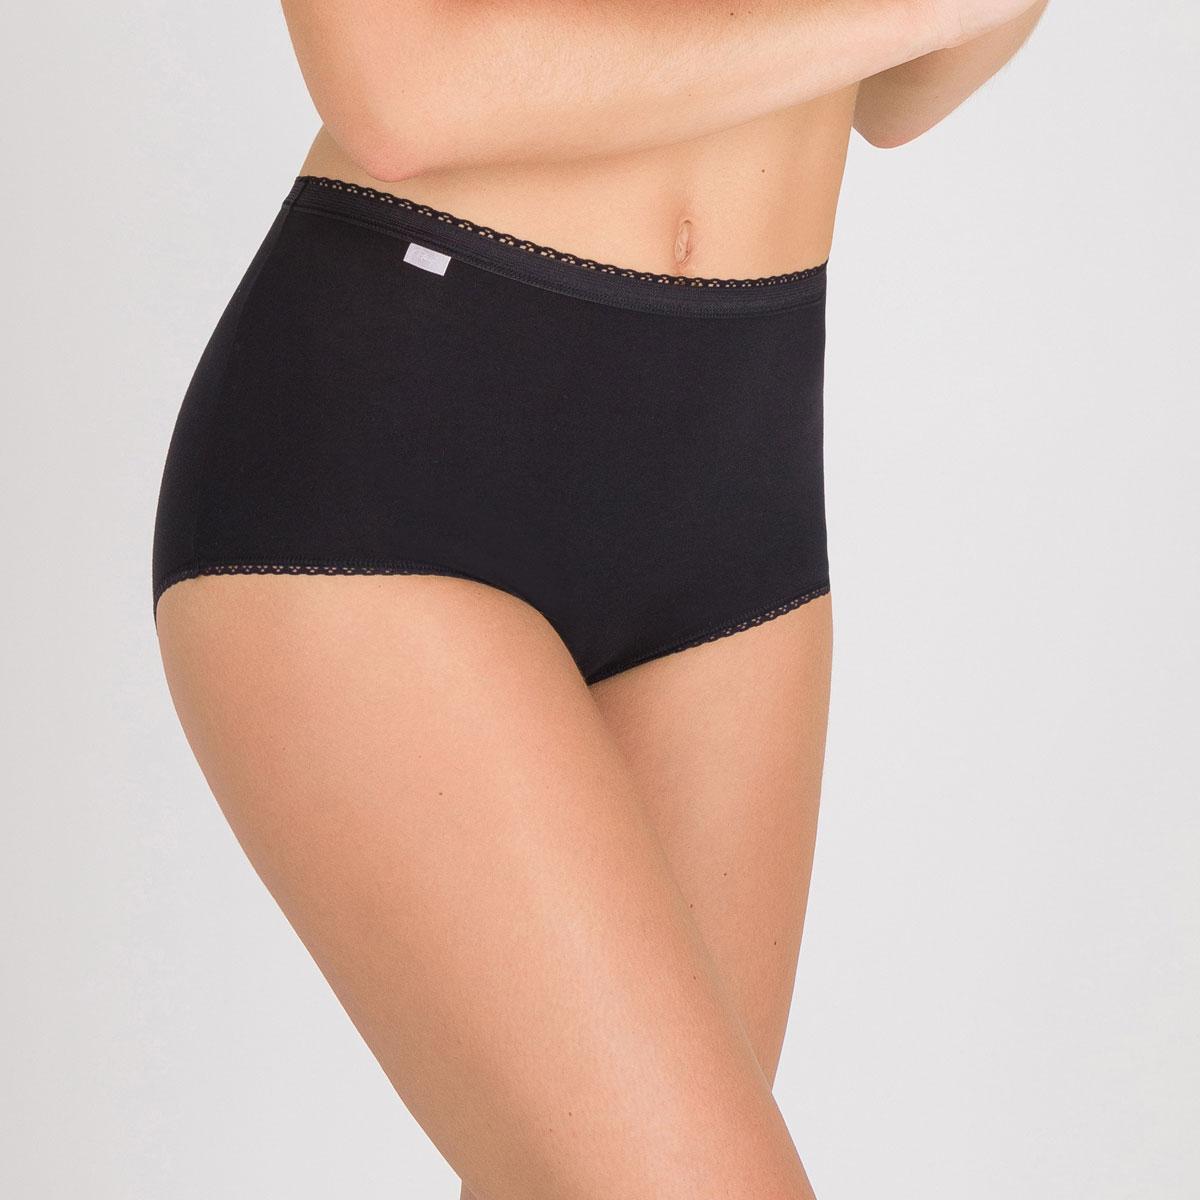 2 Culottes Maxi noires – Coton Stretch-PLAYTEX